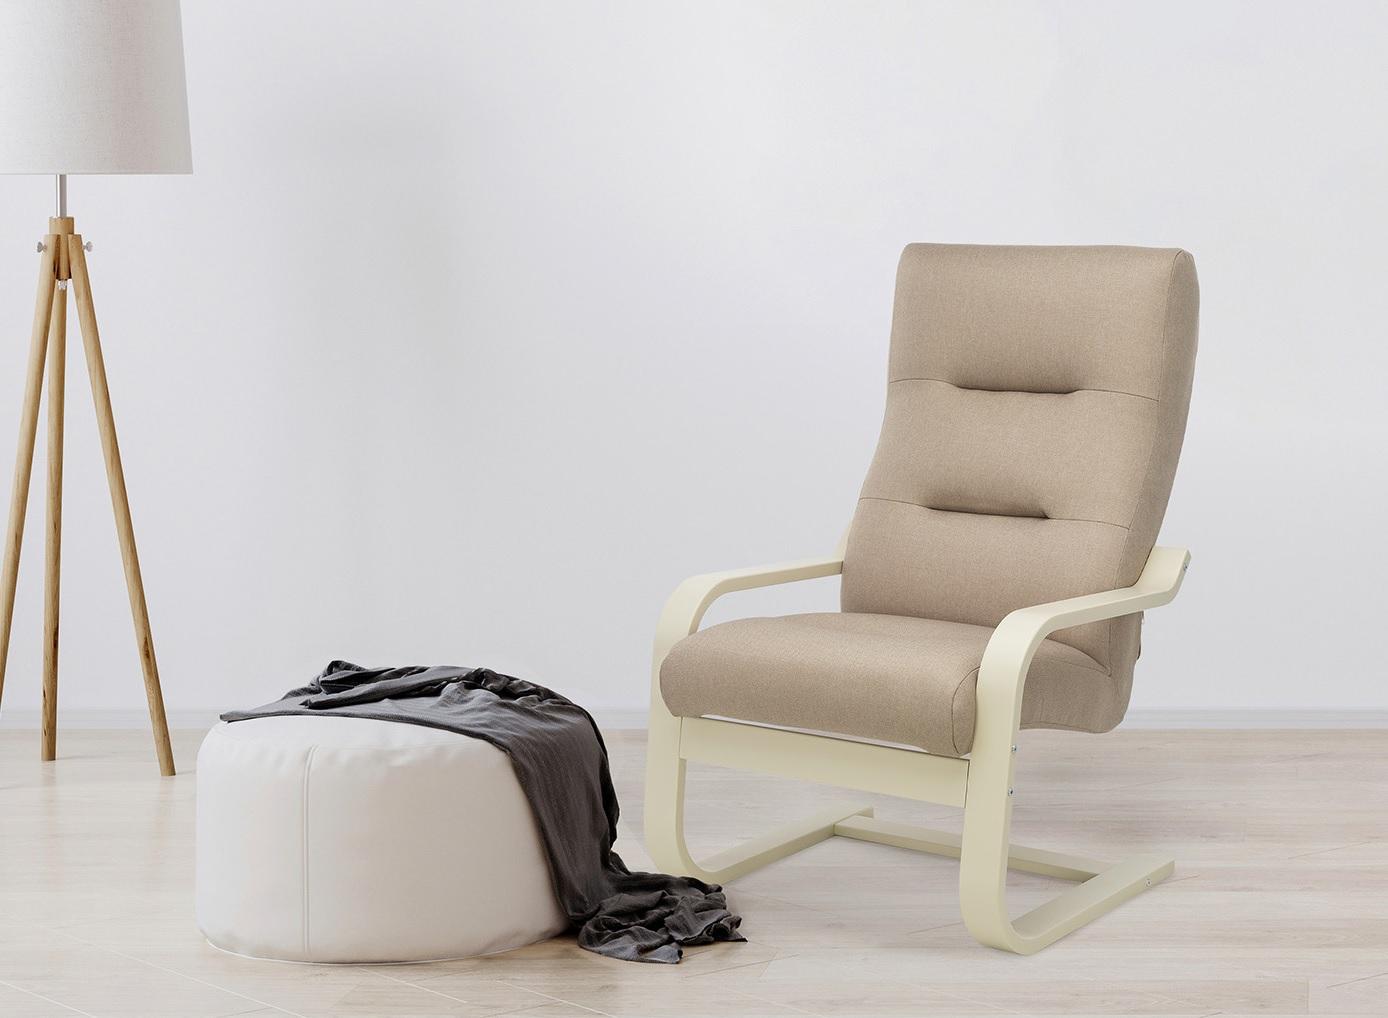 кресло для отдыха Leset Оскар Лайт